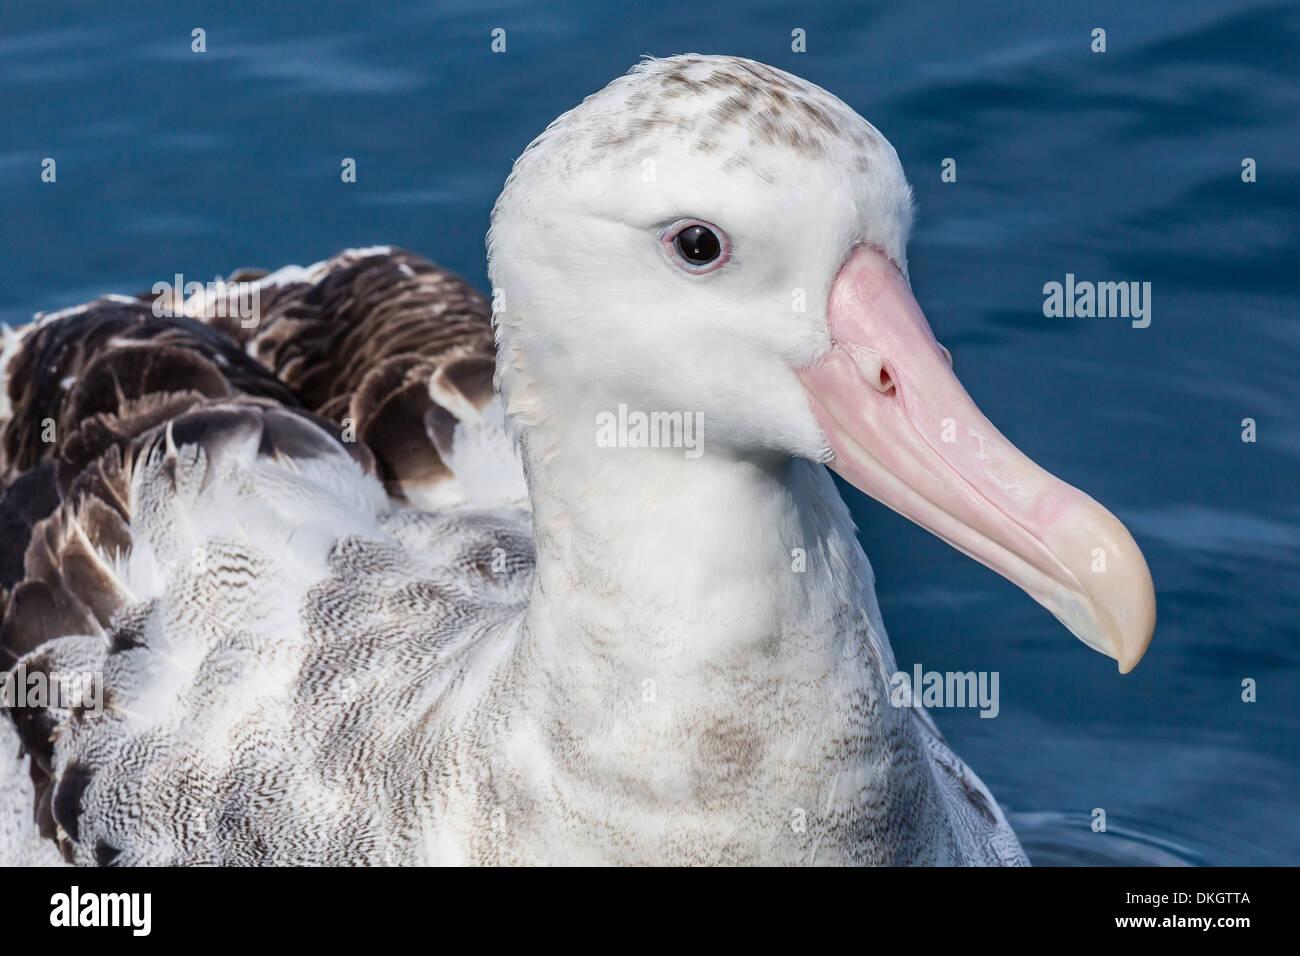 Wandering albatross, Diomedea exulans, in calm seas off Kaikoura, South Island, New Zealand - Stock Image